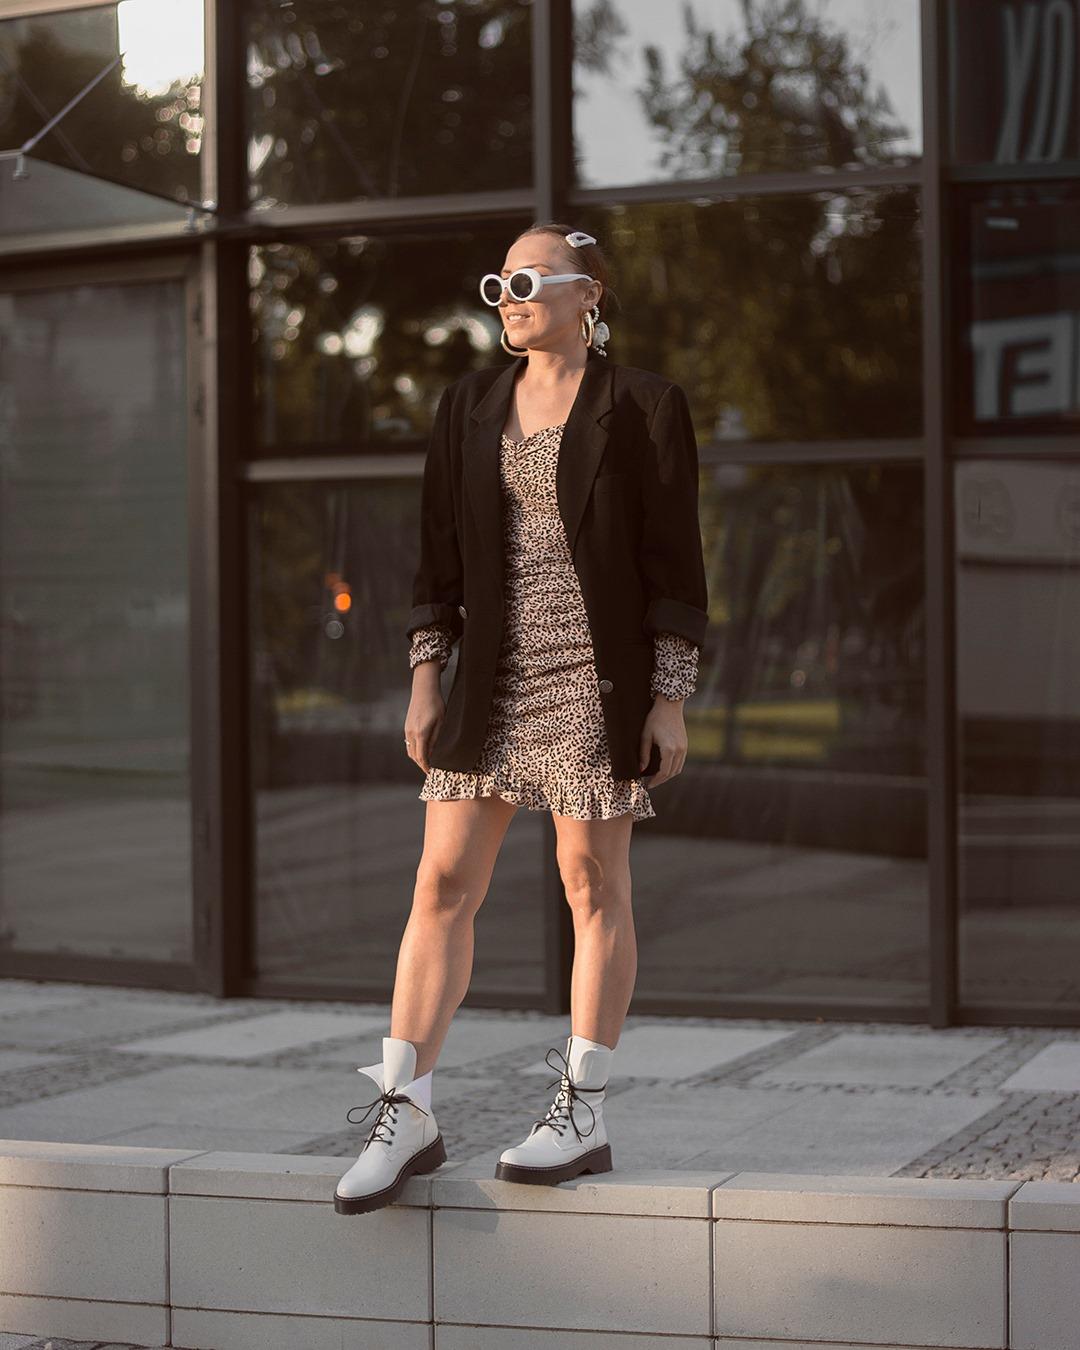 fashion blogger leo print dress femme luxe white biker boots white sunglasses pins aliexpress gold earings oversized black jacket